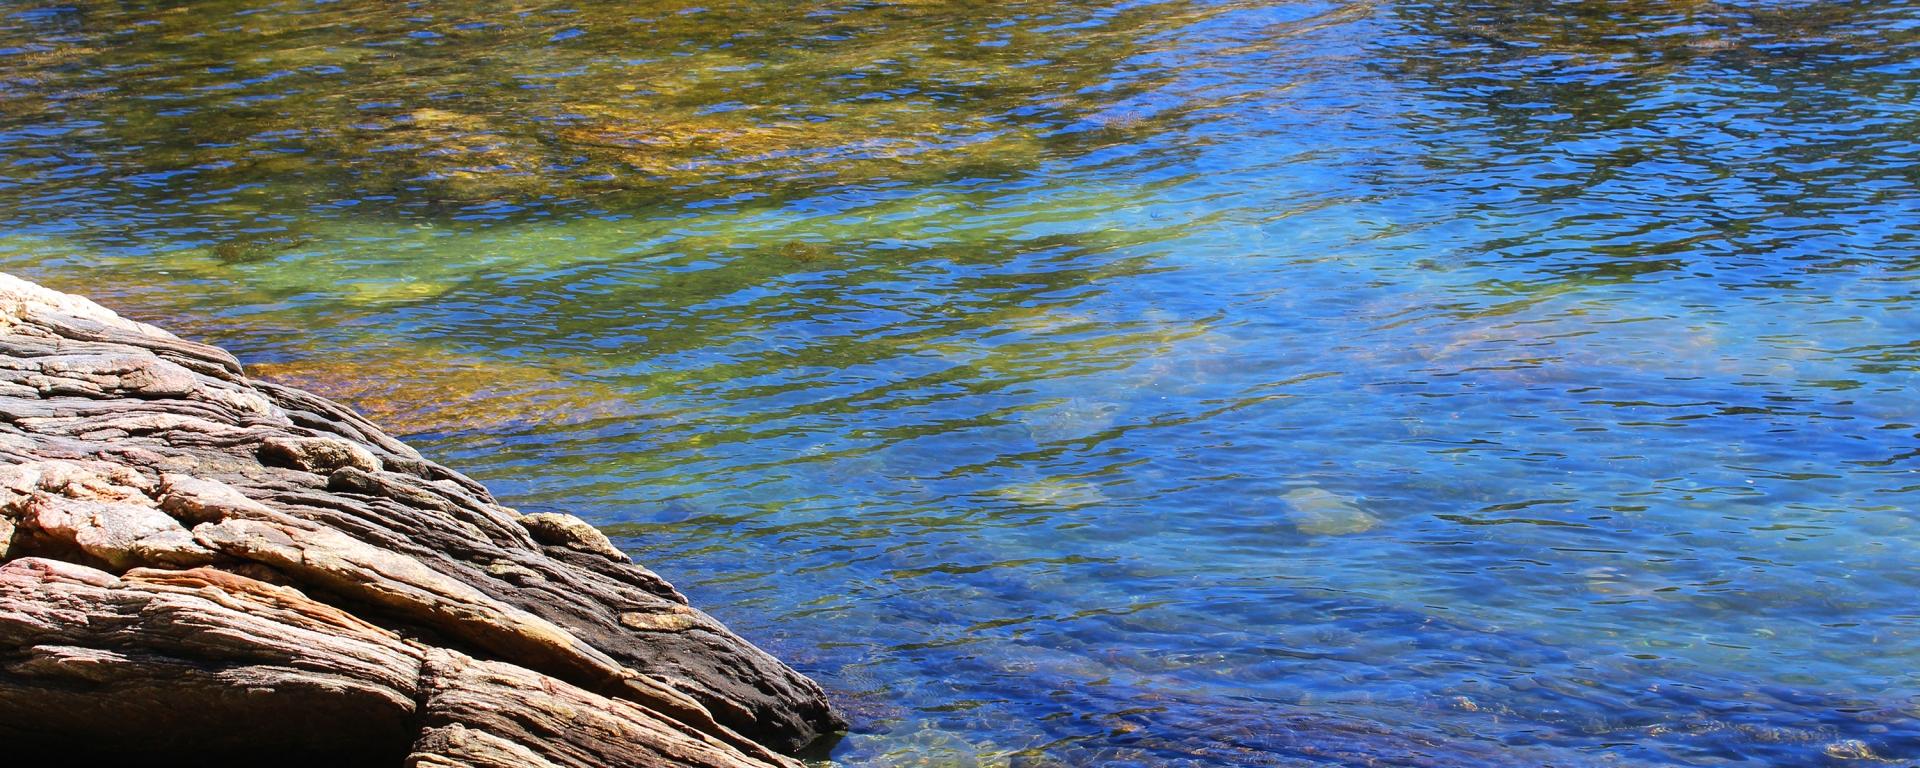 maine, water, nature, trail